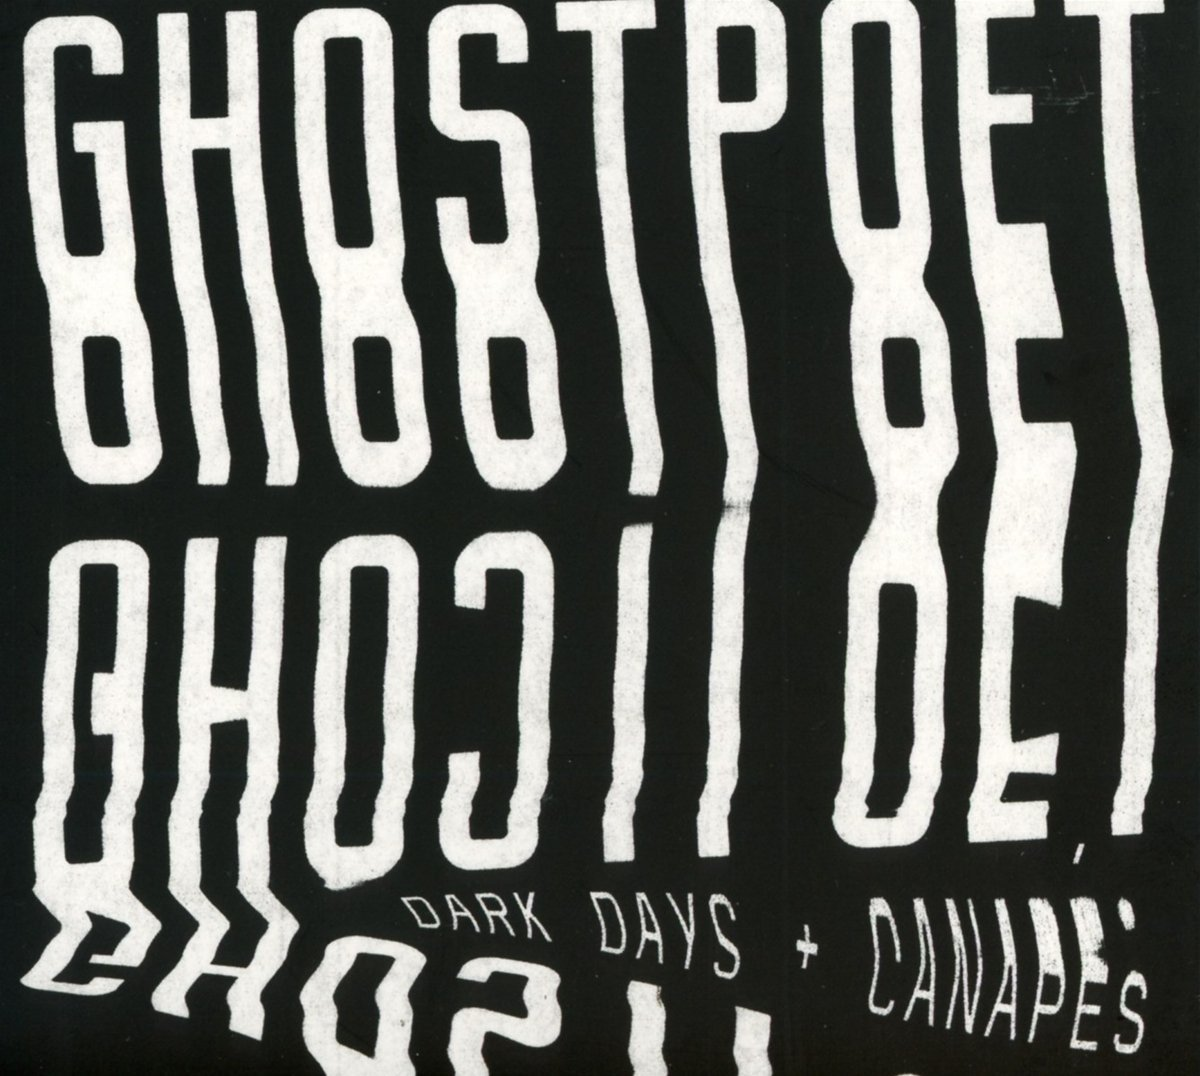 Dark Days + Canapés (LP) by Ghostpoet image